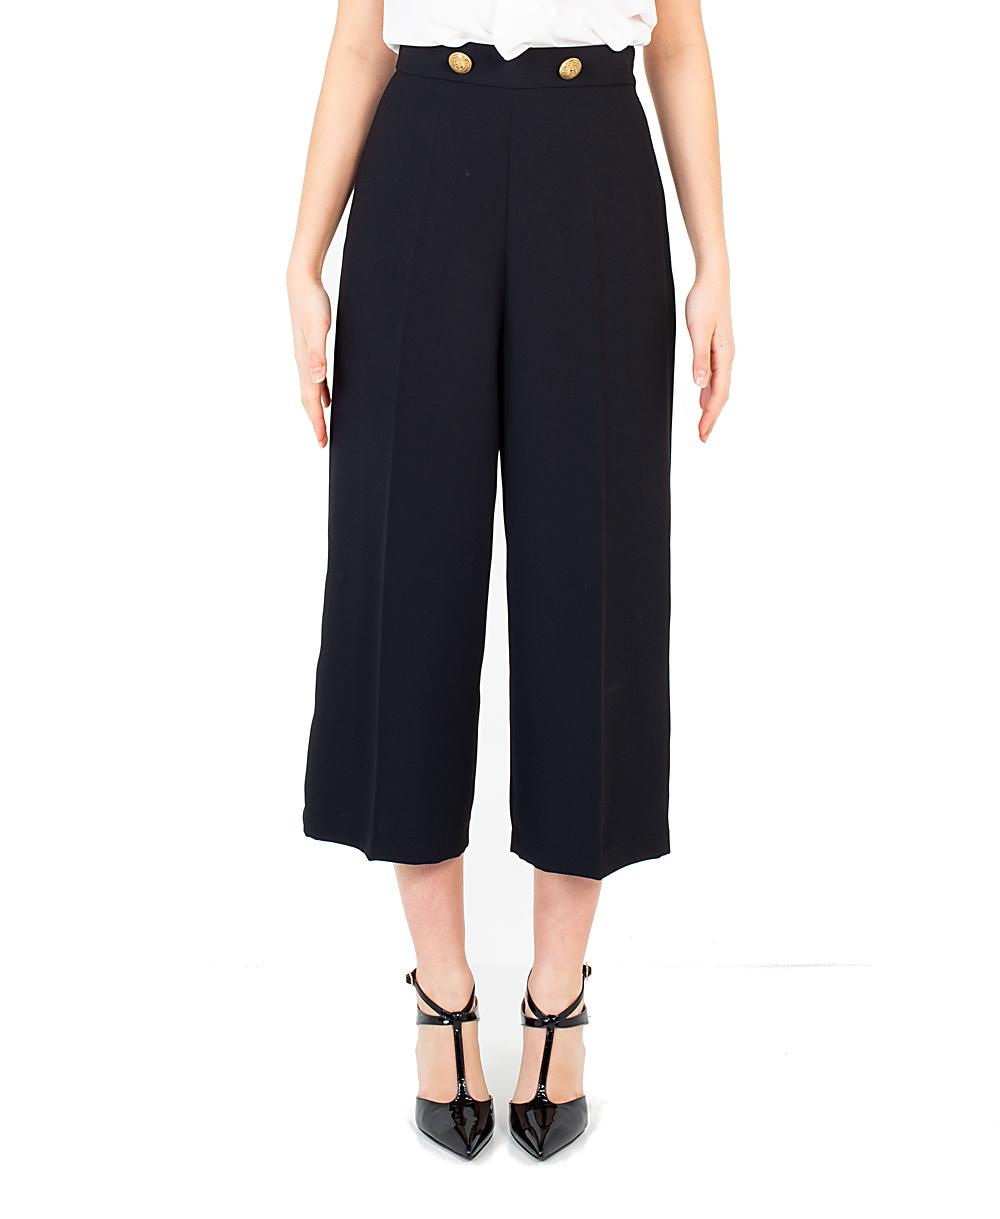 Pantalone Elisabetta Franchi PA05401E2 110NERO  -19